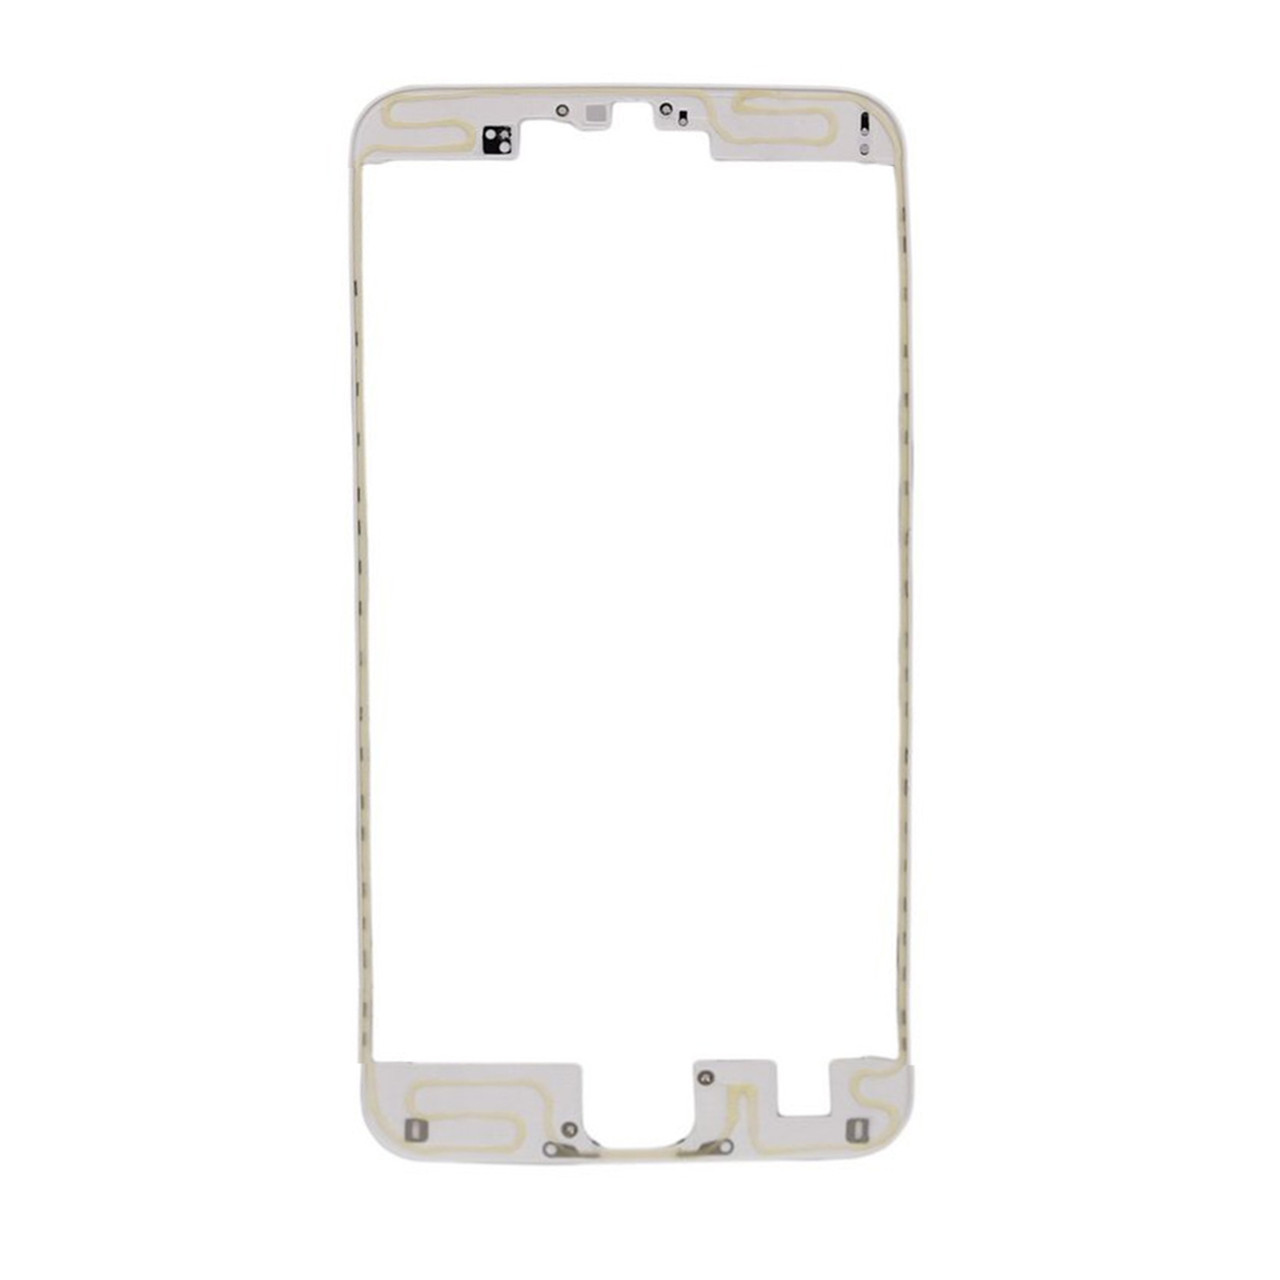 Рамка для дисплея Apple iPhone 6S Plus AAA внутренняя пустая White (10)